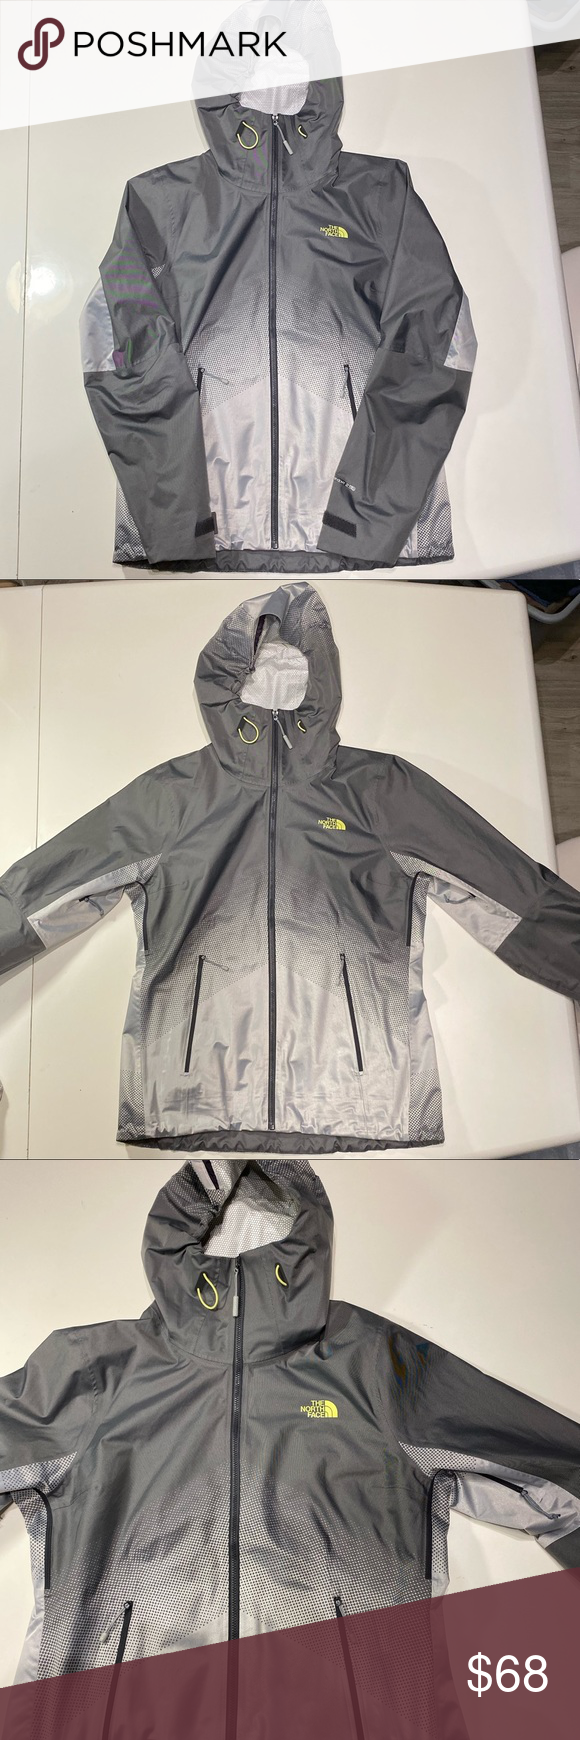 The North Face Rain Jacket North Face Rain Jacket Jackets Rain Jacket [ 1740 x 580 Pixel ]